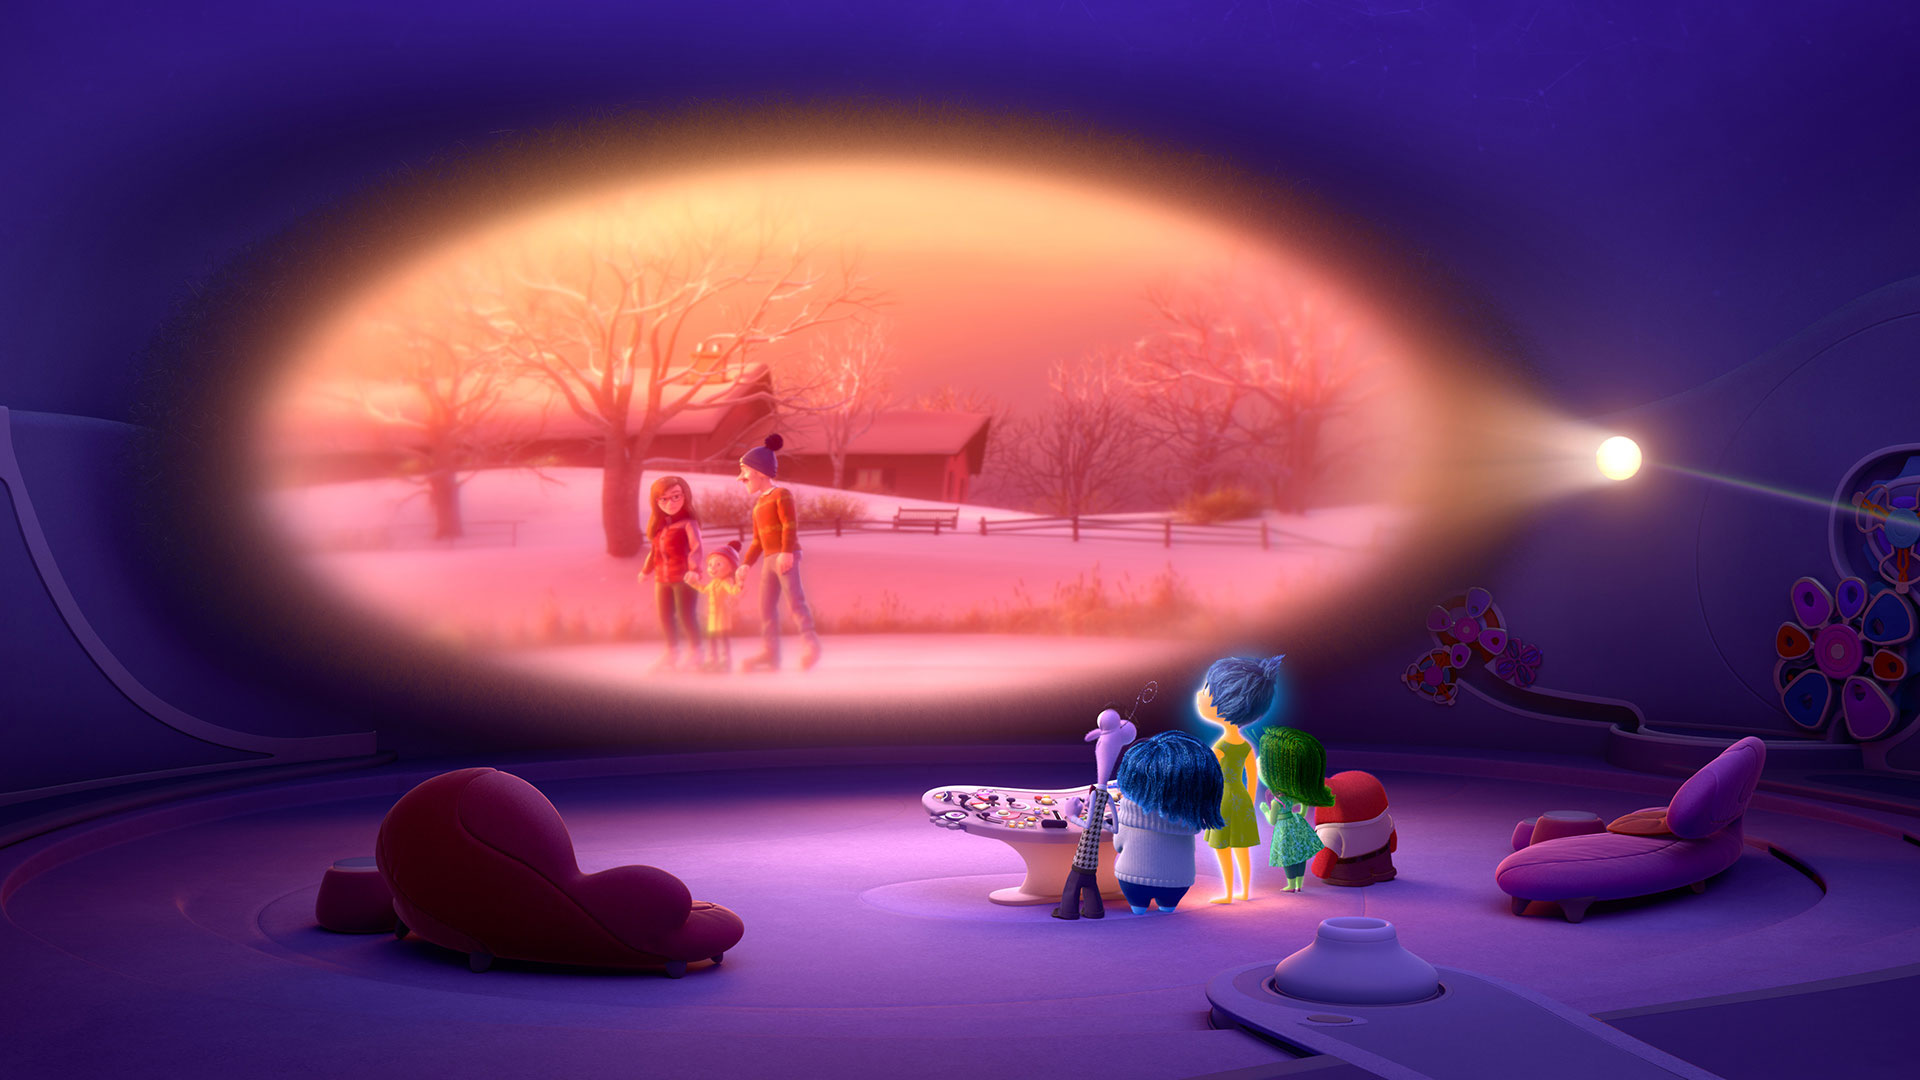 Disney Inside Out 2015 Movie Wallpapers Desktop iPhone 6 1920x1080